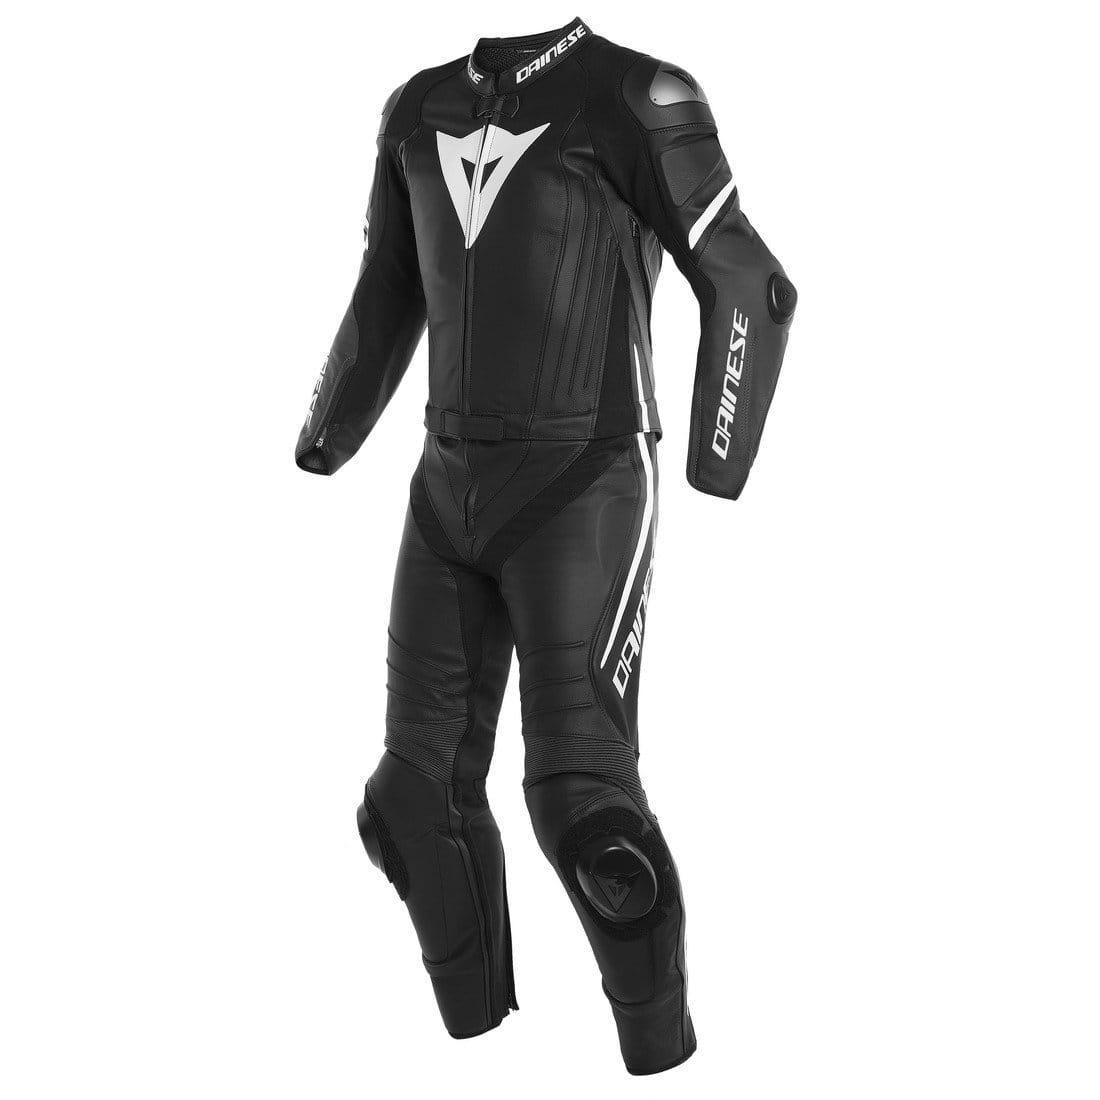 Мотокомбинезон Dainese Laguna Seca 4 2PC Black